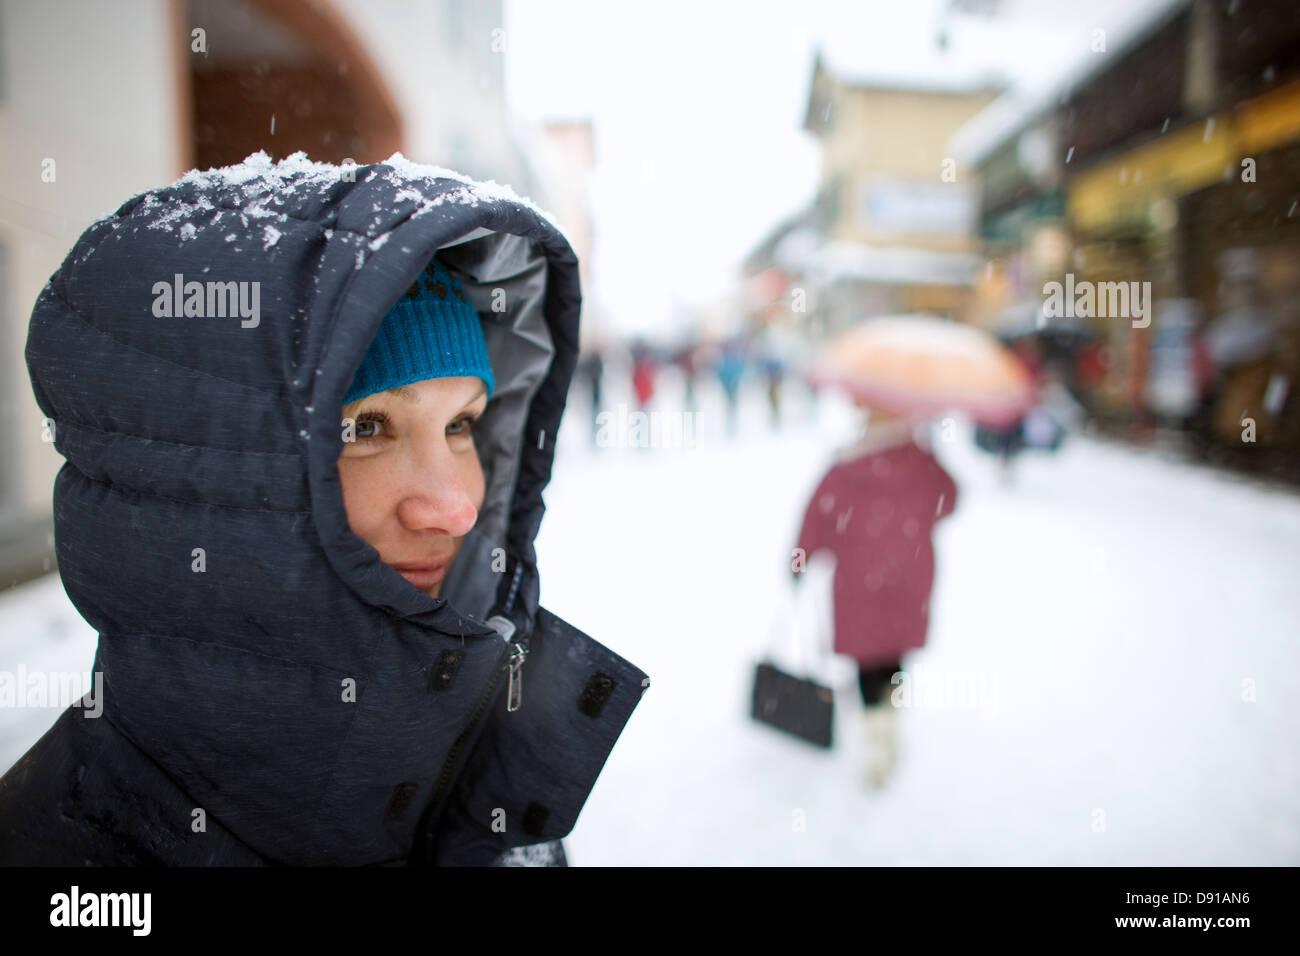 A woman on a pedestrian precinct, Chamonix, France. - Stock Image